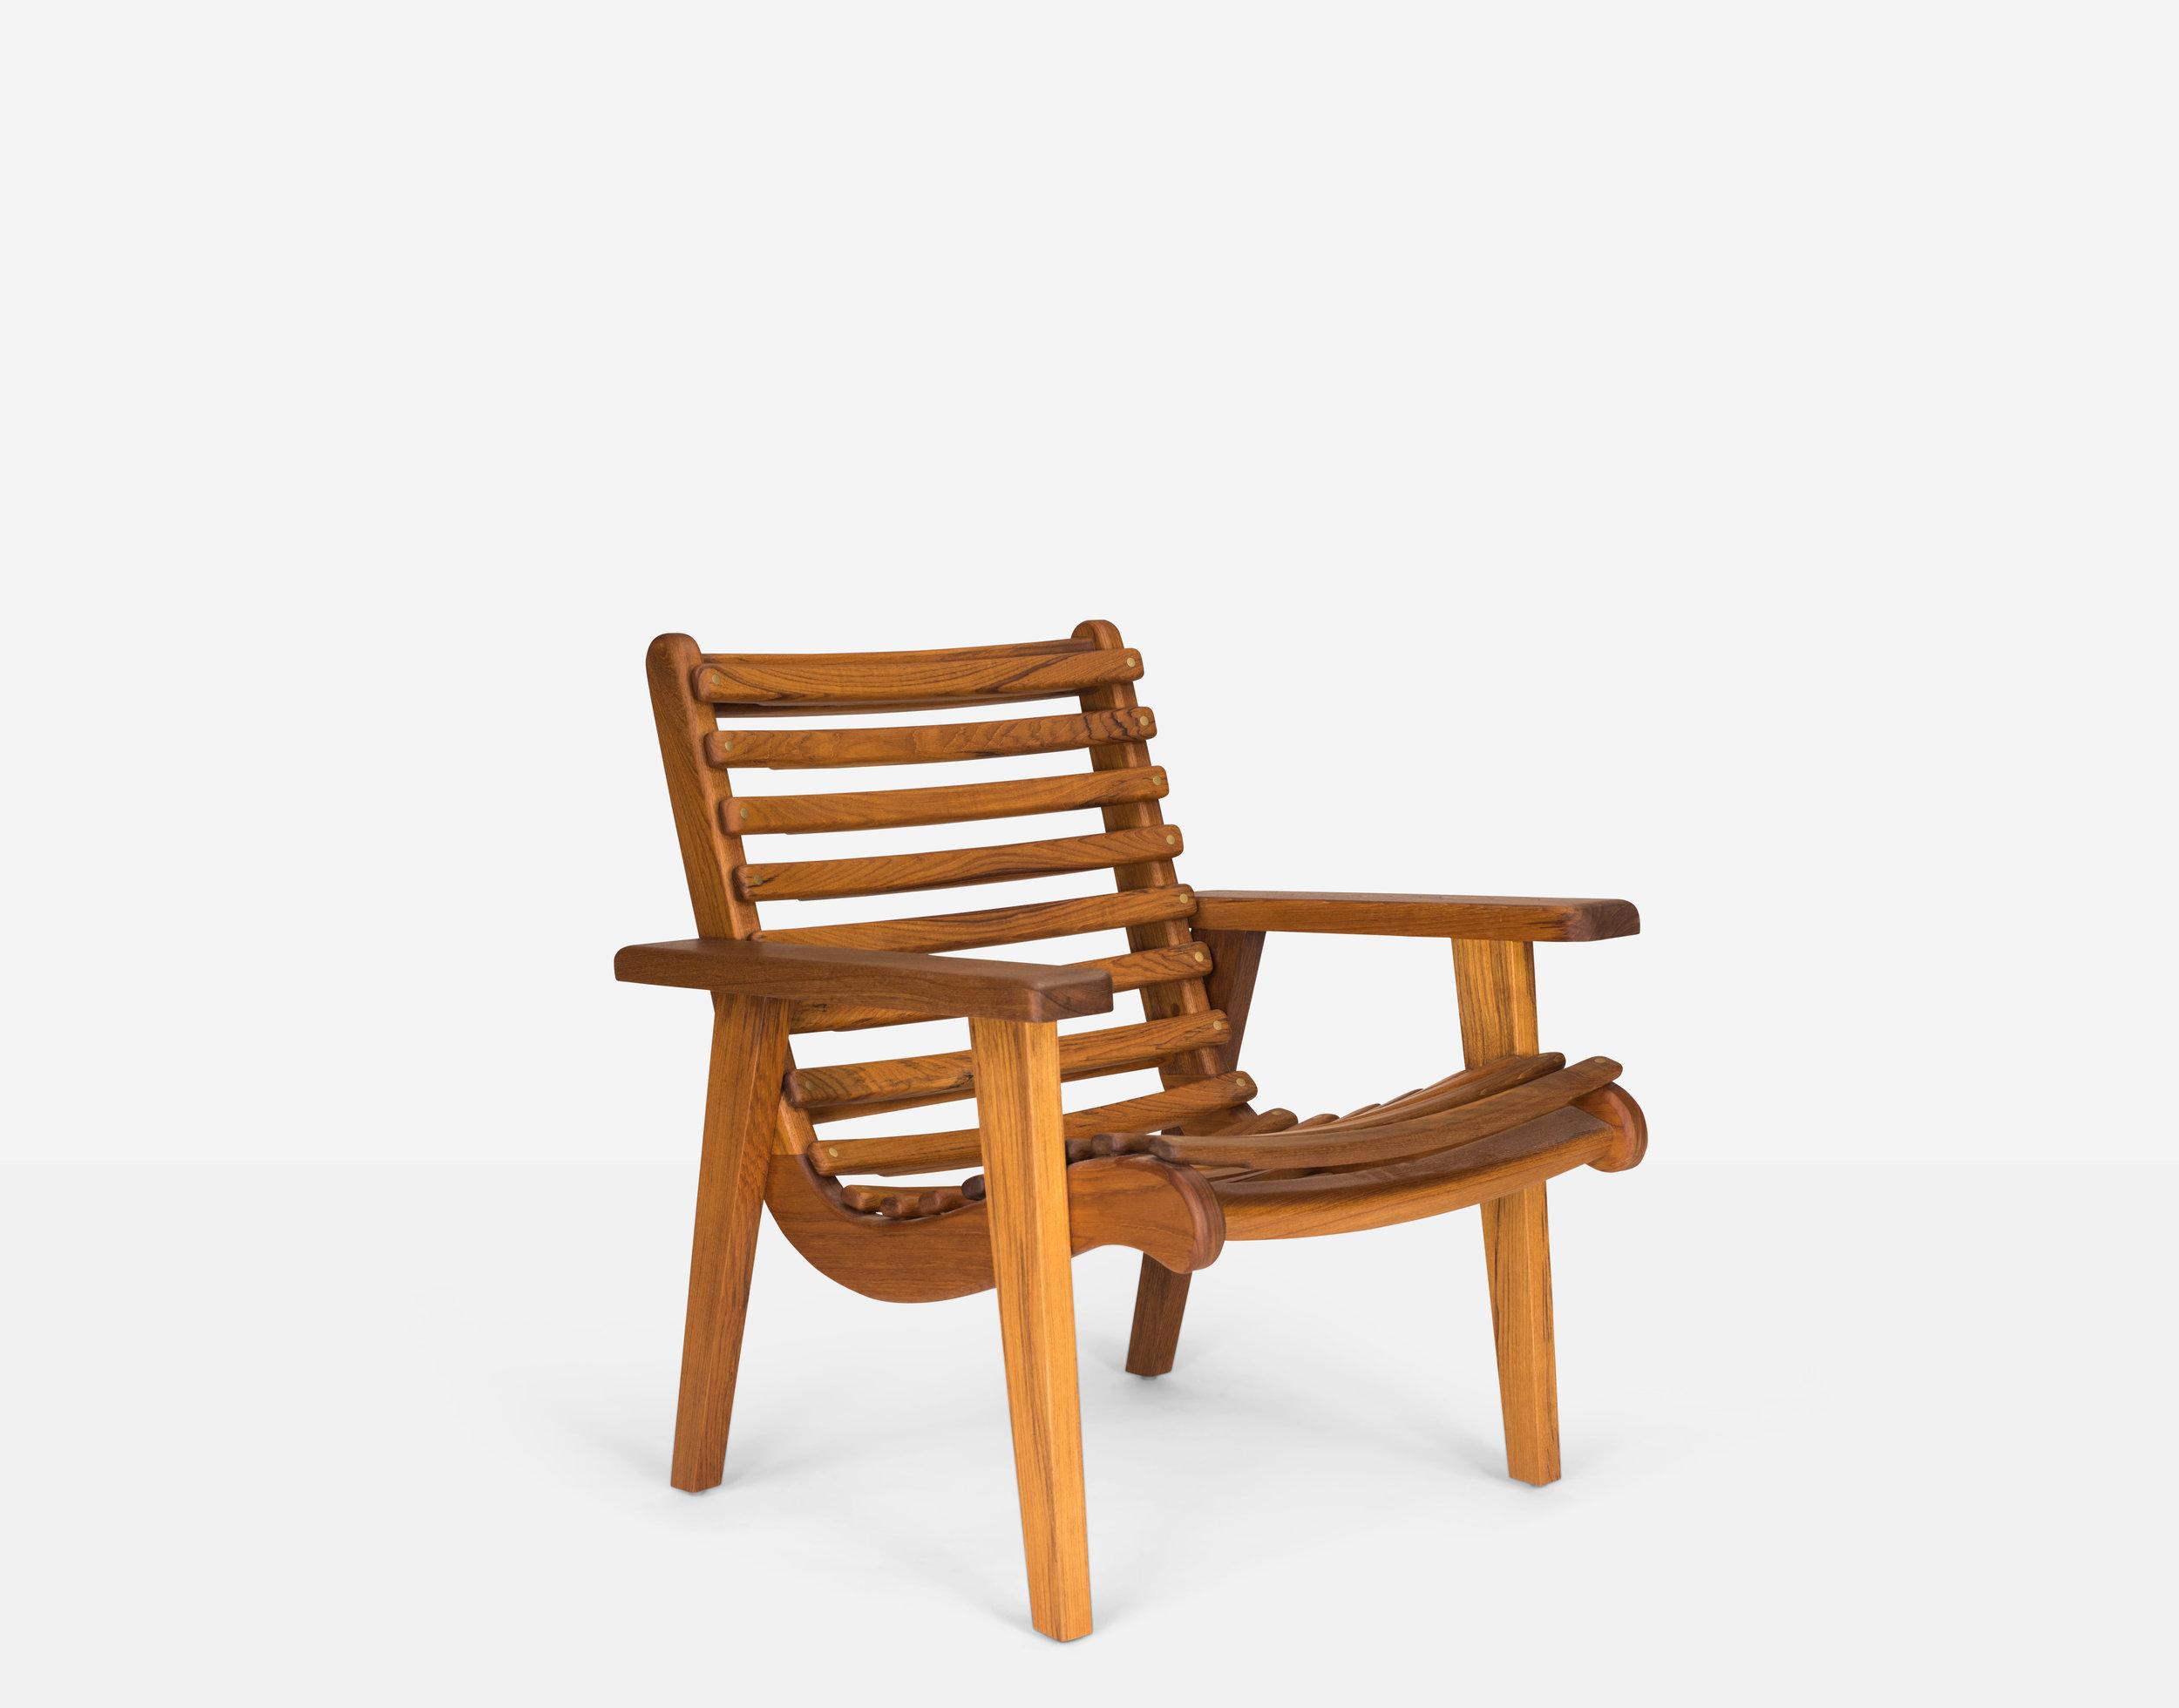 Luteca_MvB_San Miguelito-Armchair_Teak_FP-W.jpg